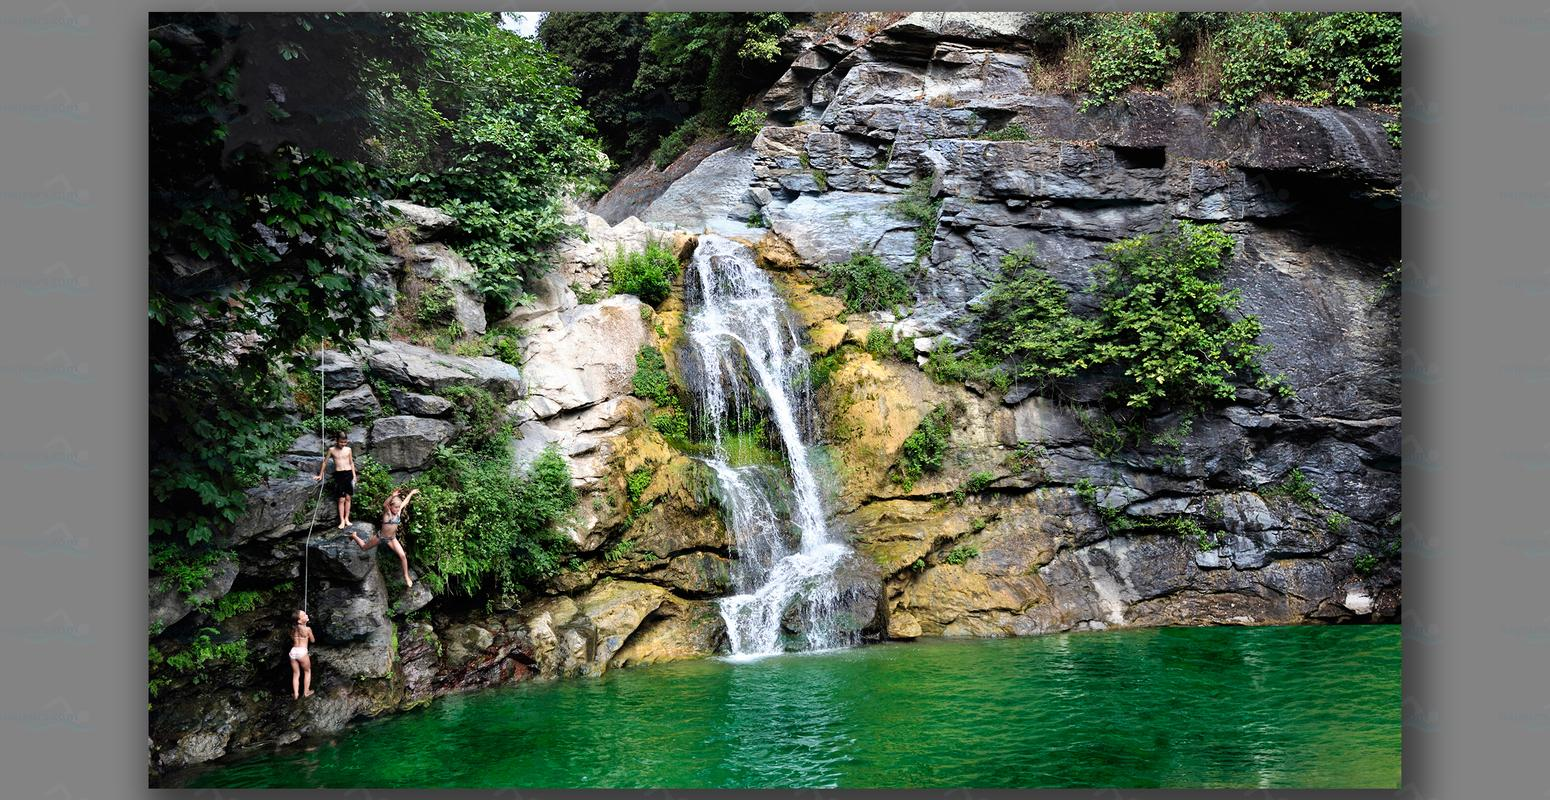 Piscine naturelle du bucatoghju for Combien coute une piscine naturelle